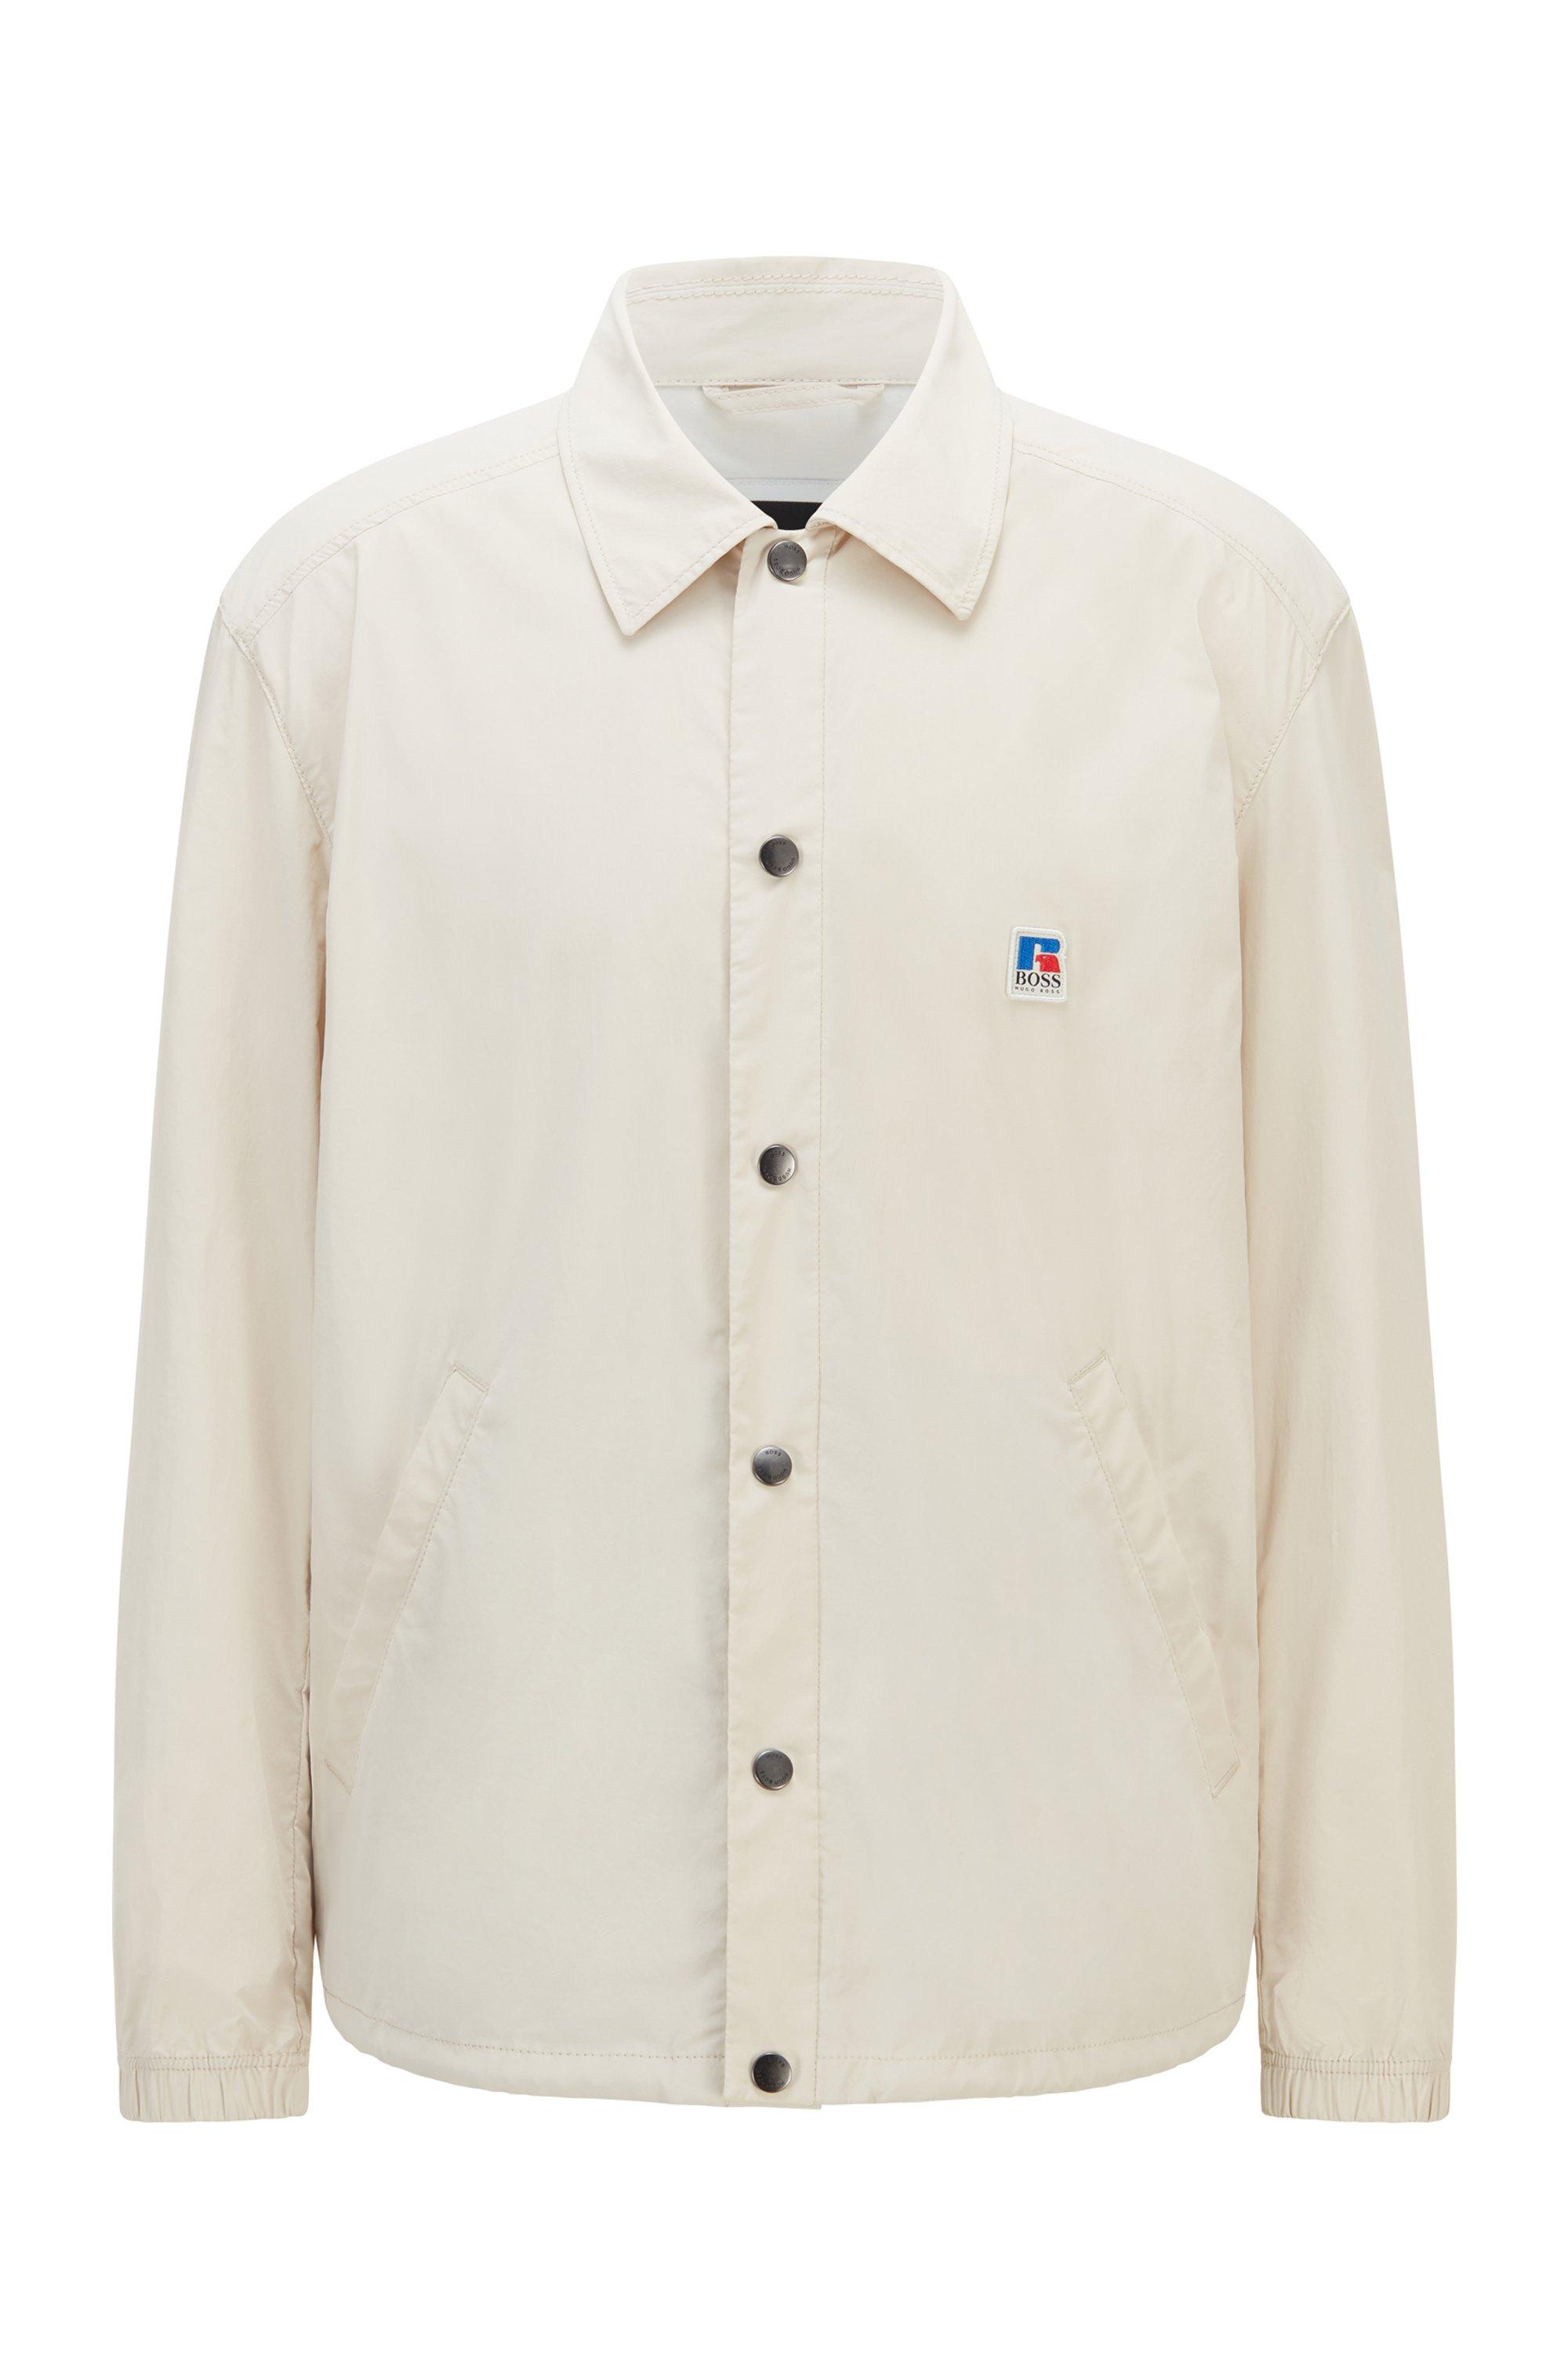 Cazadora relaxed fit en algodón recubierto con logo exclusivo, Beige claro